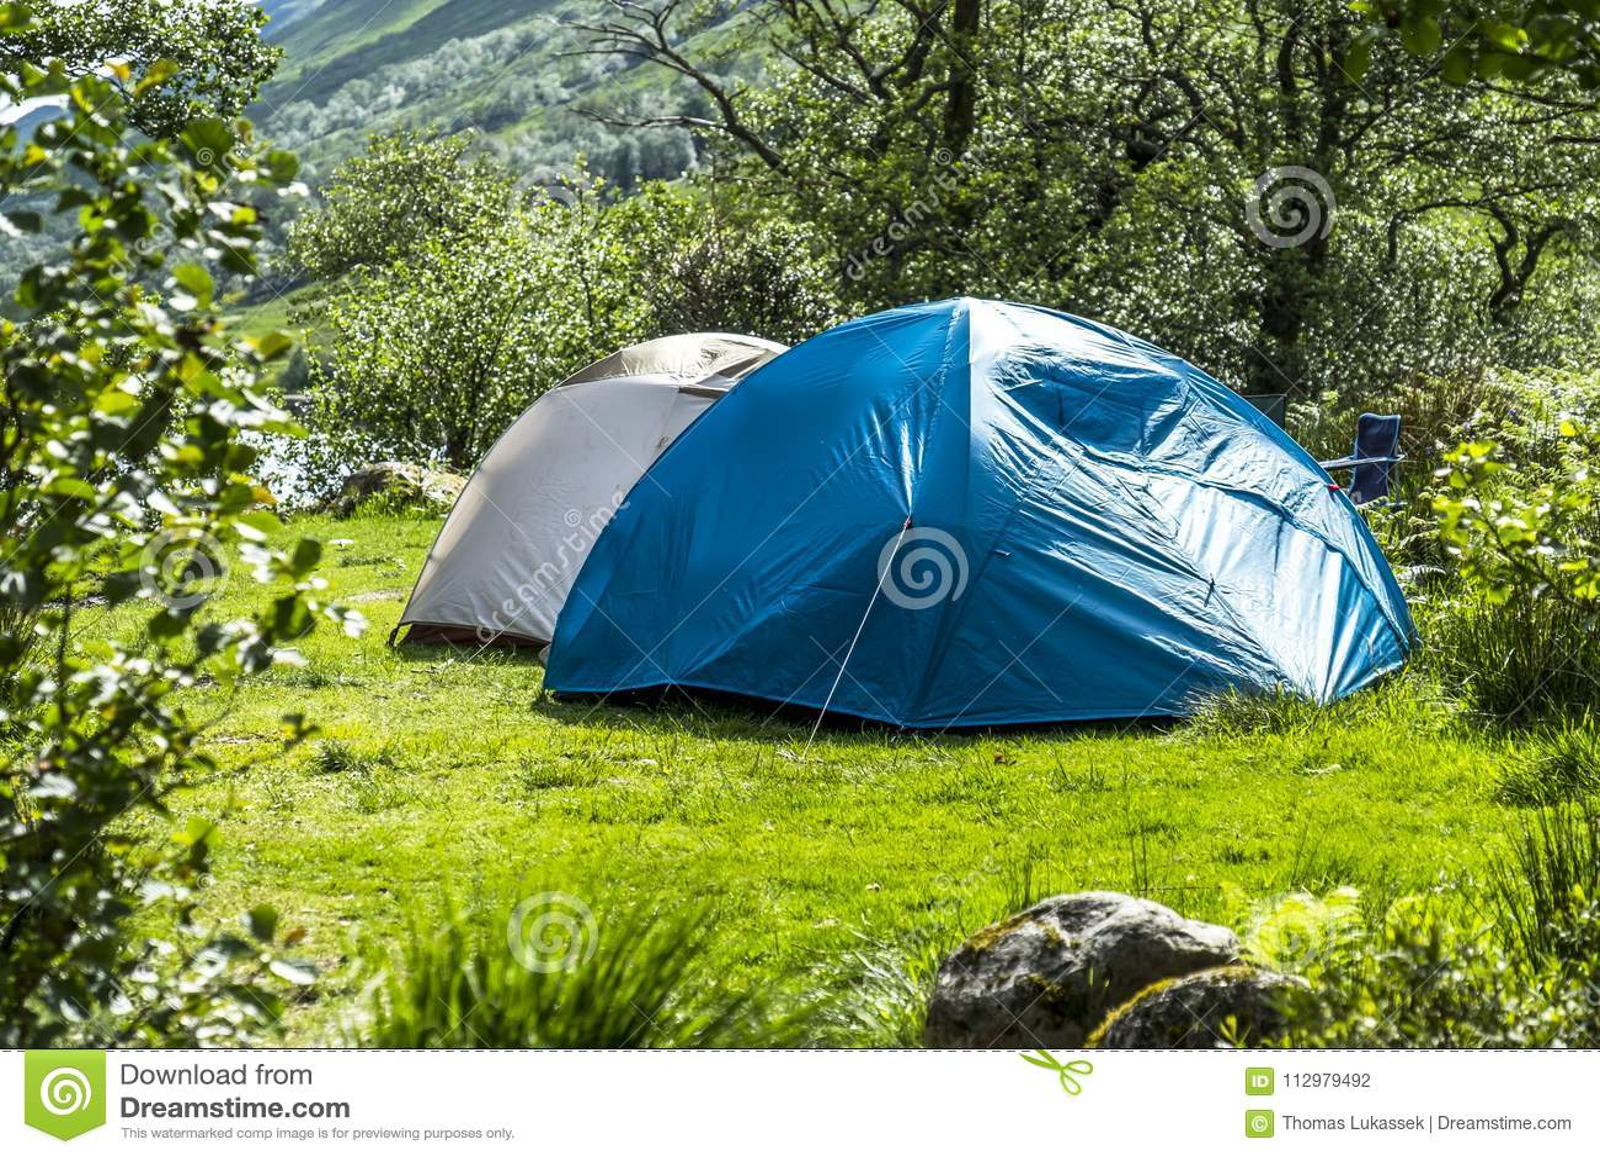 Wild camping in the wildernis of Glen Etive, Scotland